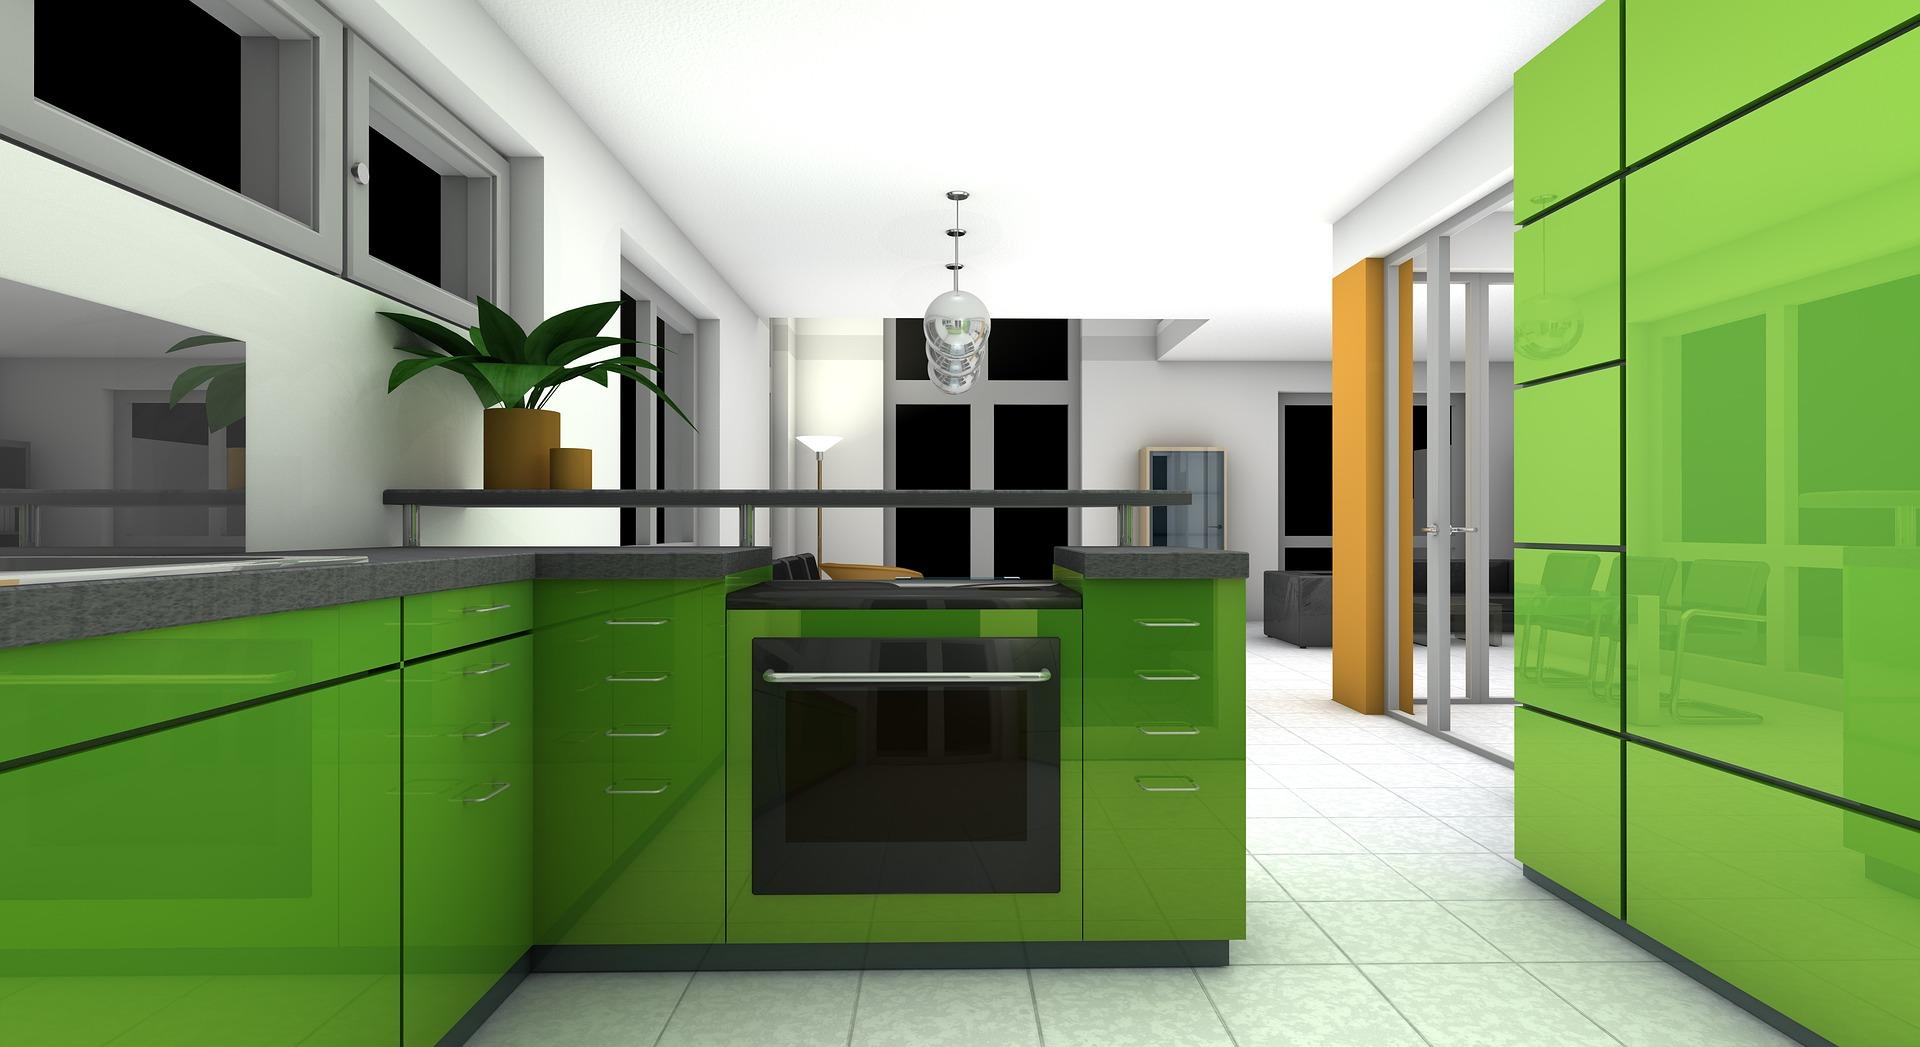 k chenshop 24 und k chenstudio in magdeburg sachsen anhalt. Black Bedroom Furniture Sets. Home Design Ideas